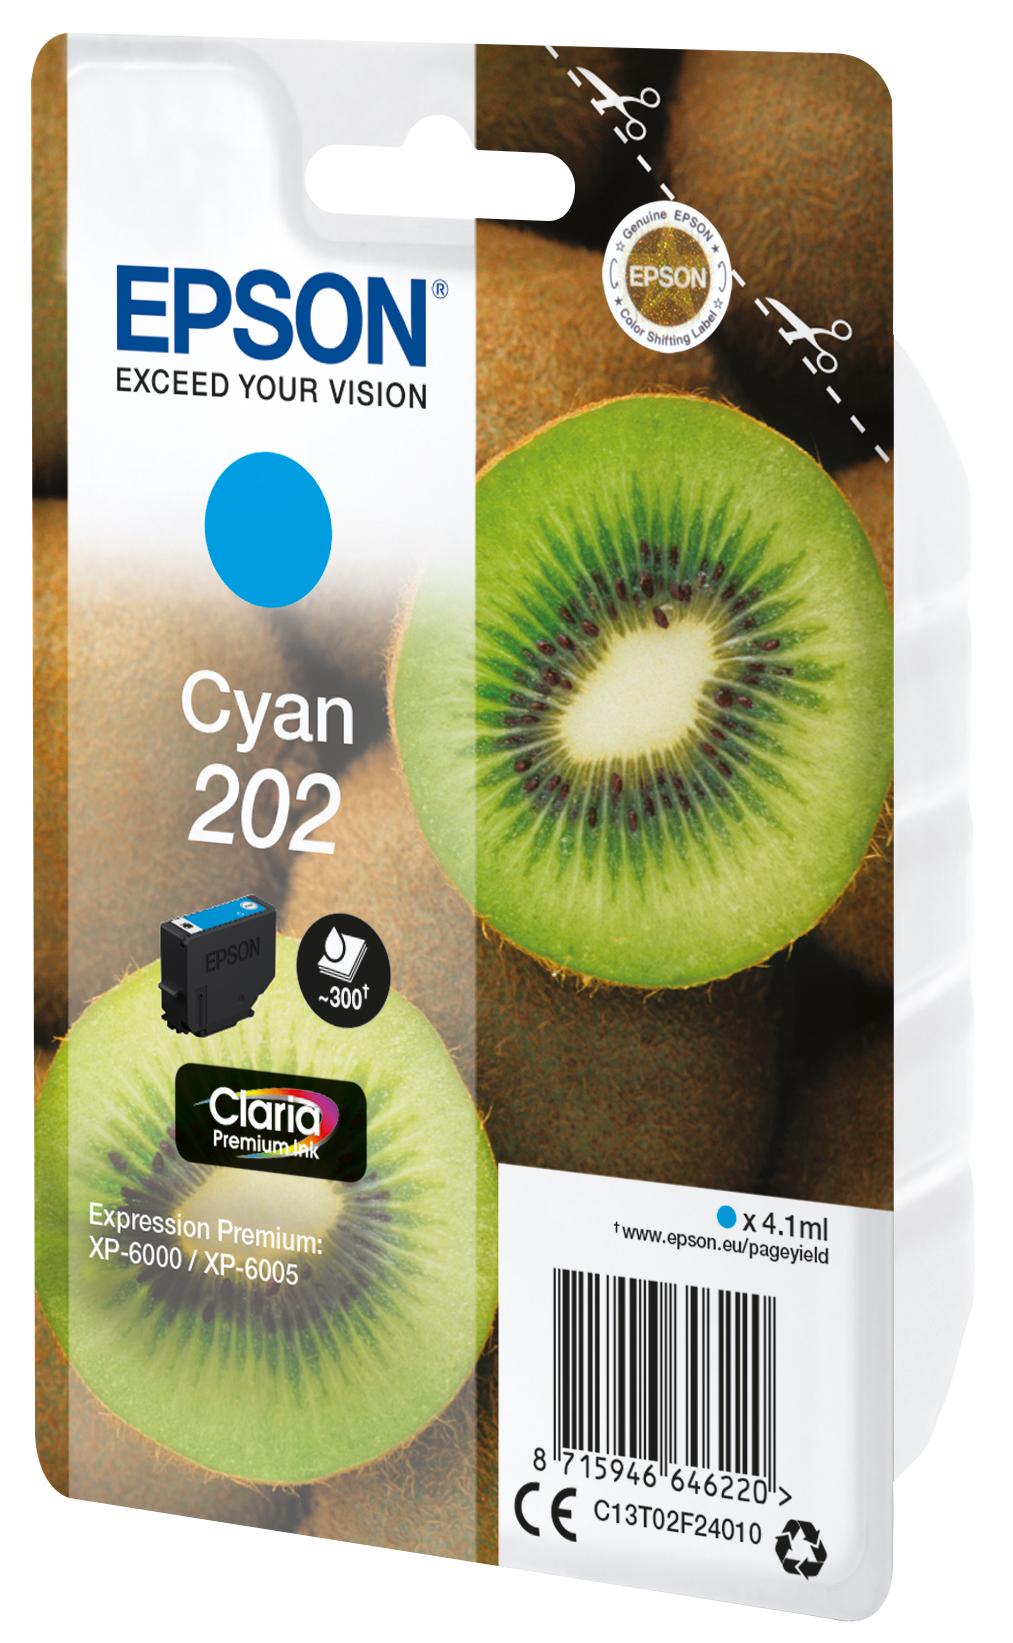 Epson-C13T02F24020-Kiwi-Singlepack-Cyan-202-Claria-Premium-Ink-Original thumbnail 3